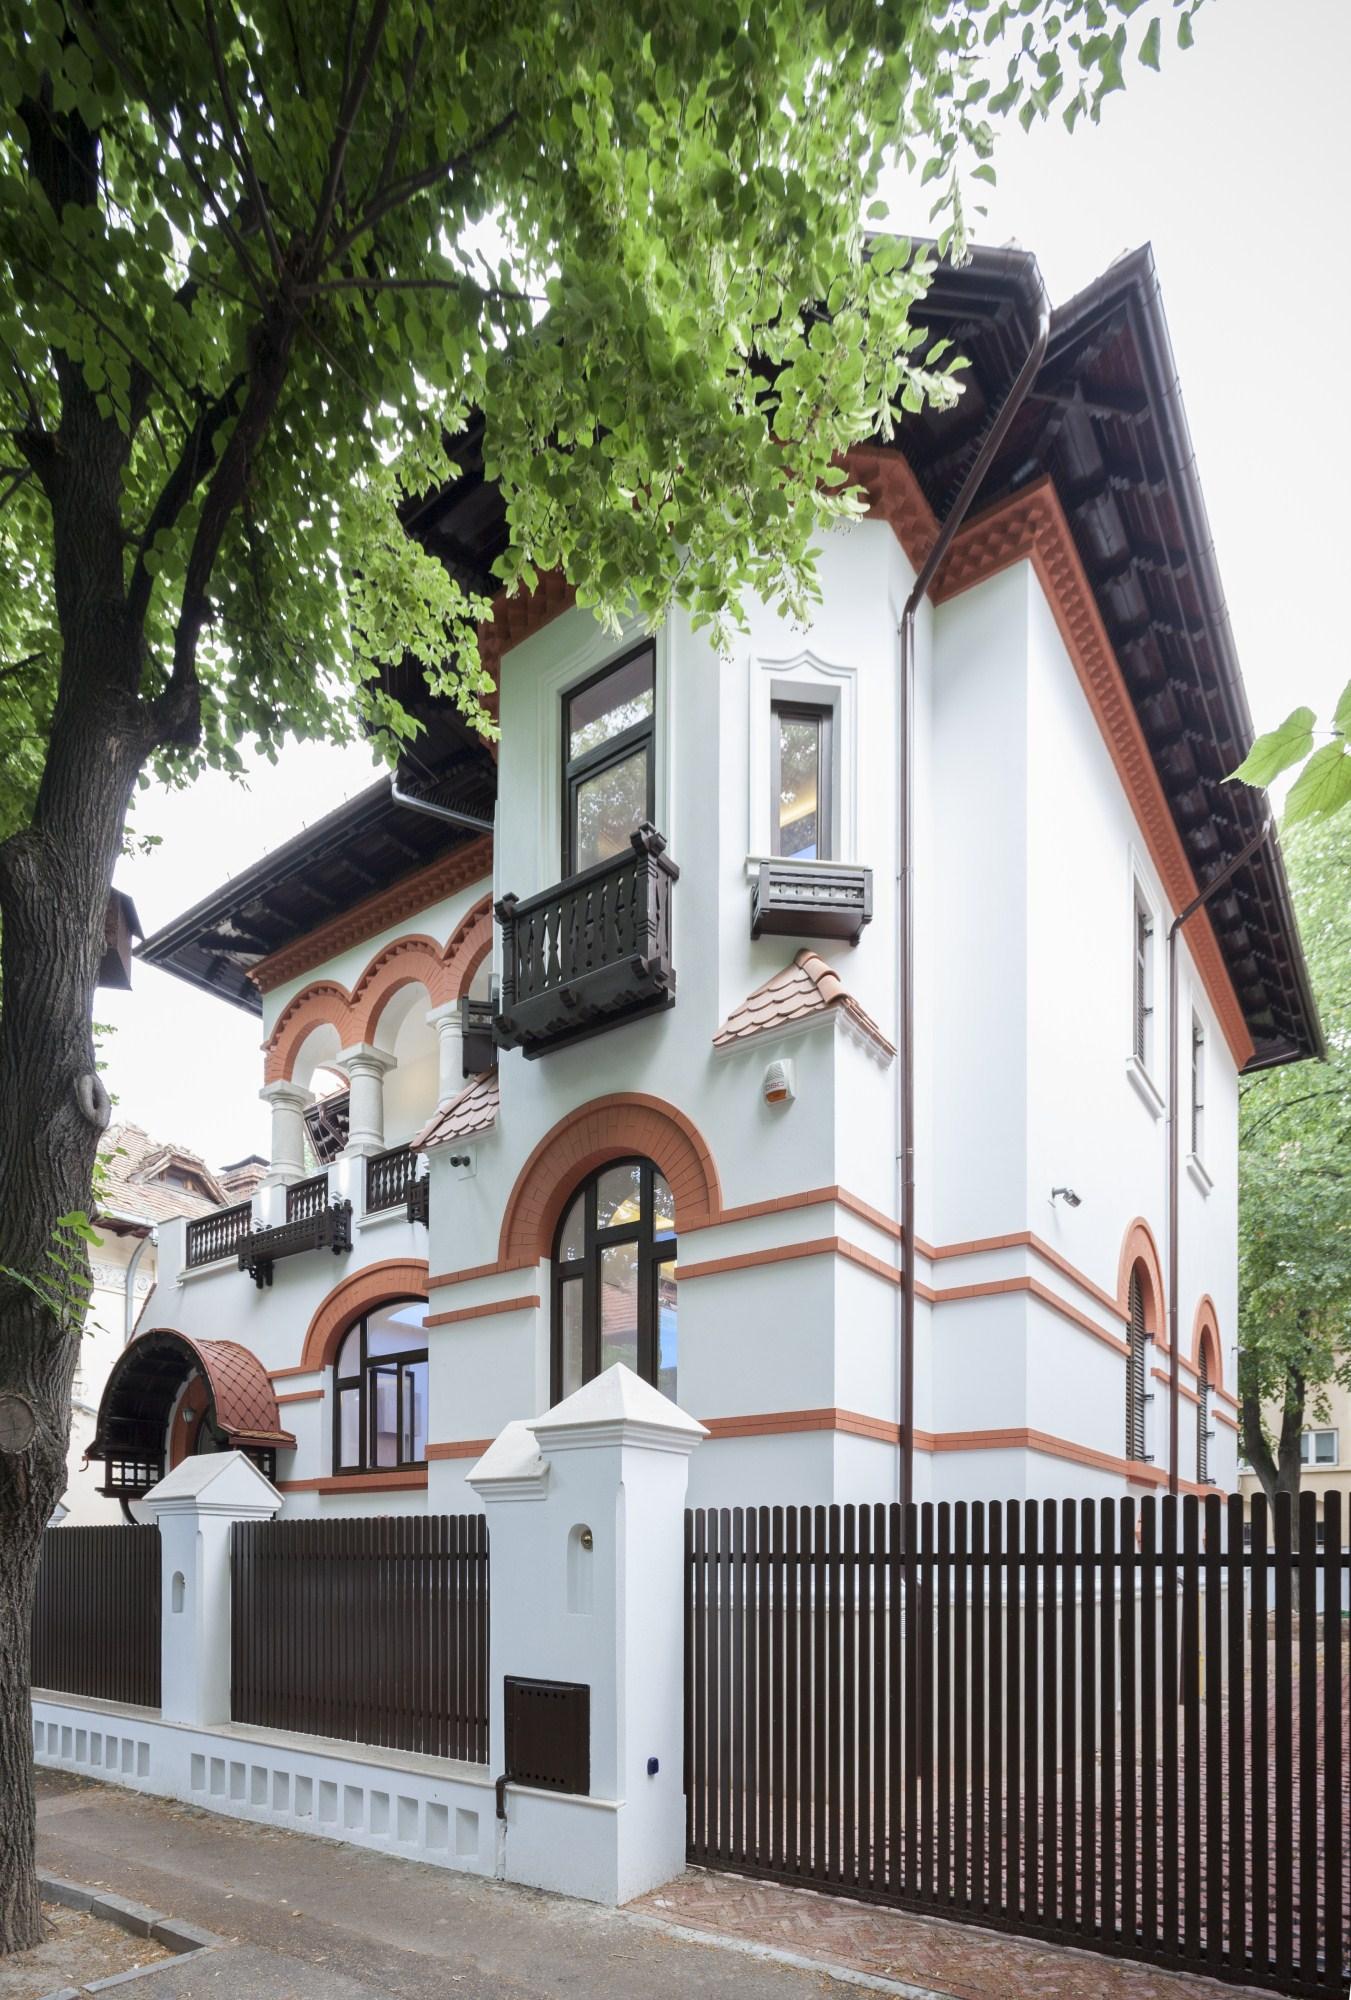 https://nbc-arhitect.ro/wp-content/uploads/2020/10/NBC-Arhitect-_-restorations-_-Washington-House-_-Bucharest-Romania_41.jpg